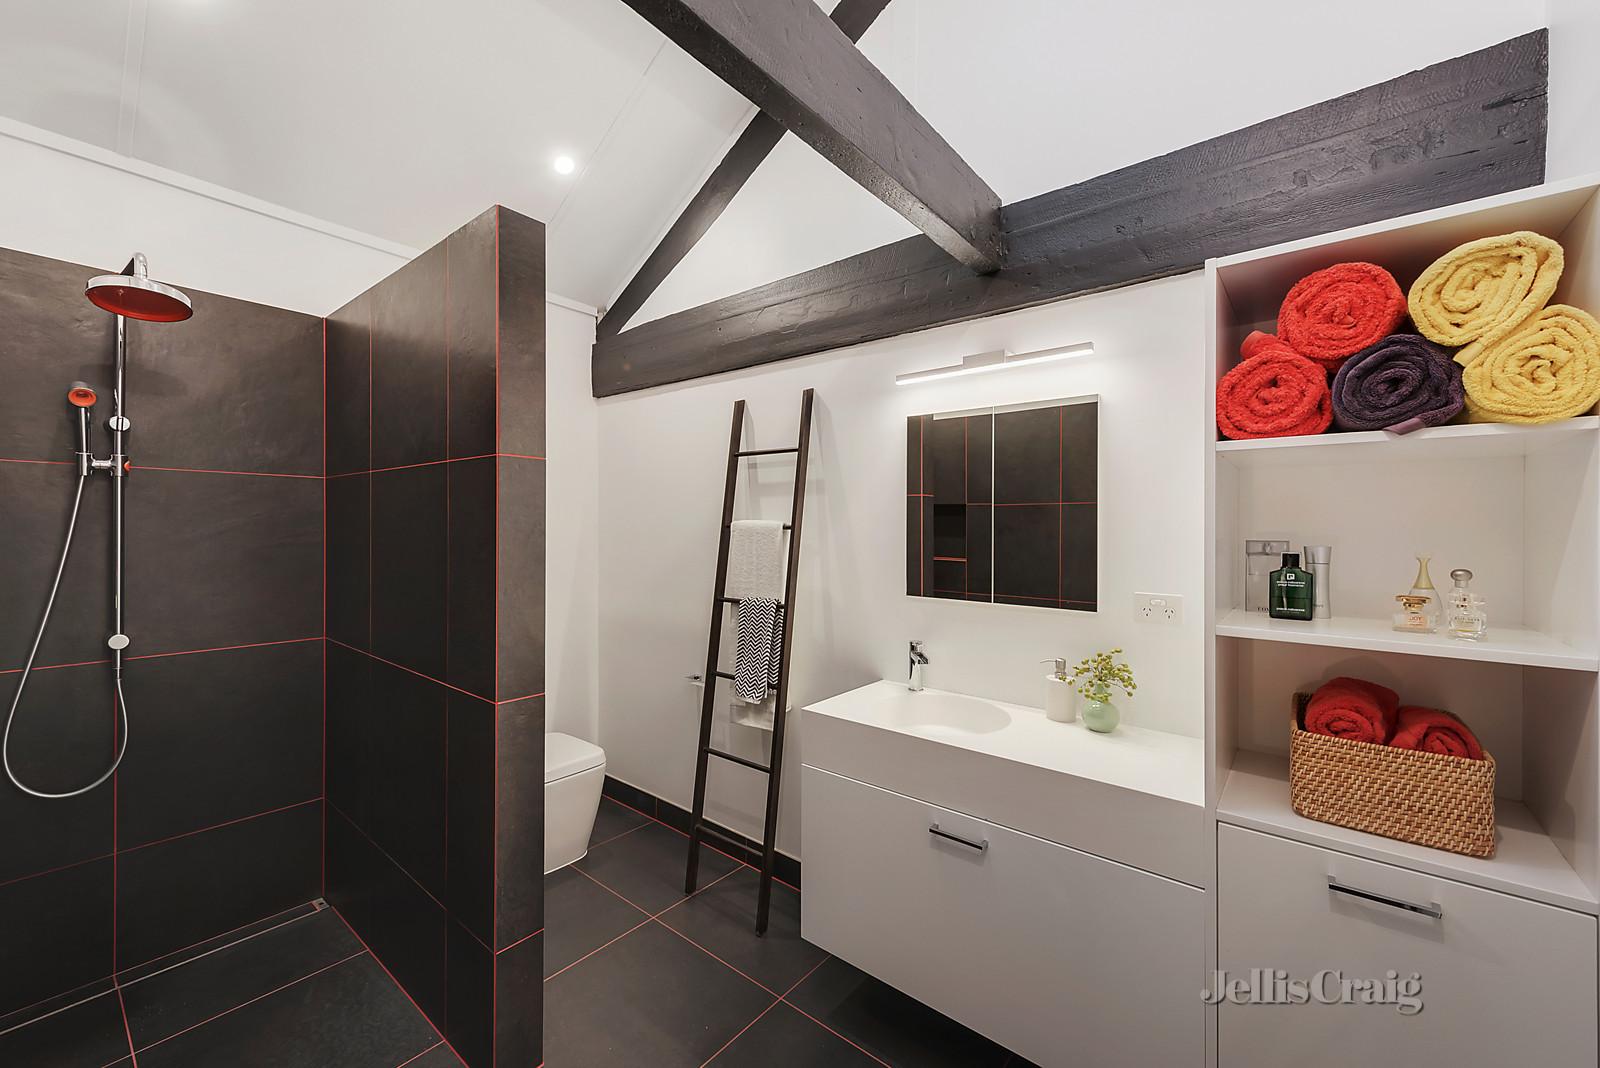 15 Bendigo Street, North Melbourne VIC 3051 - House For Sale   Domain